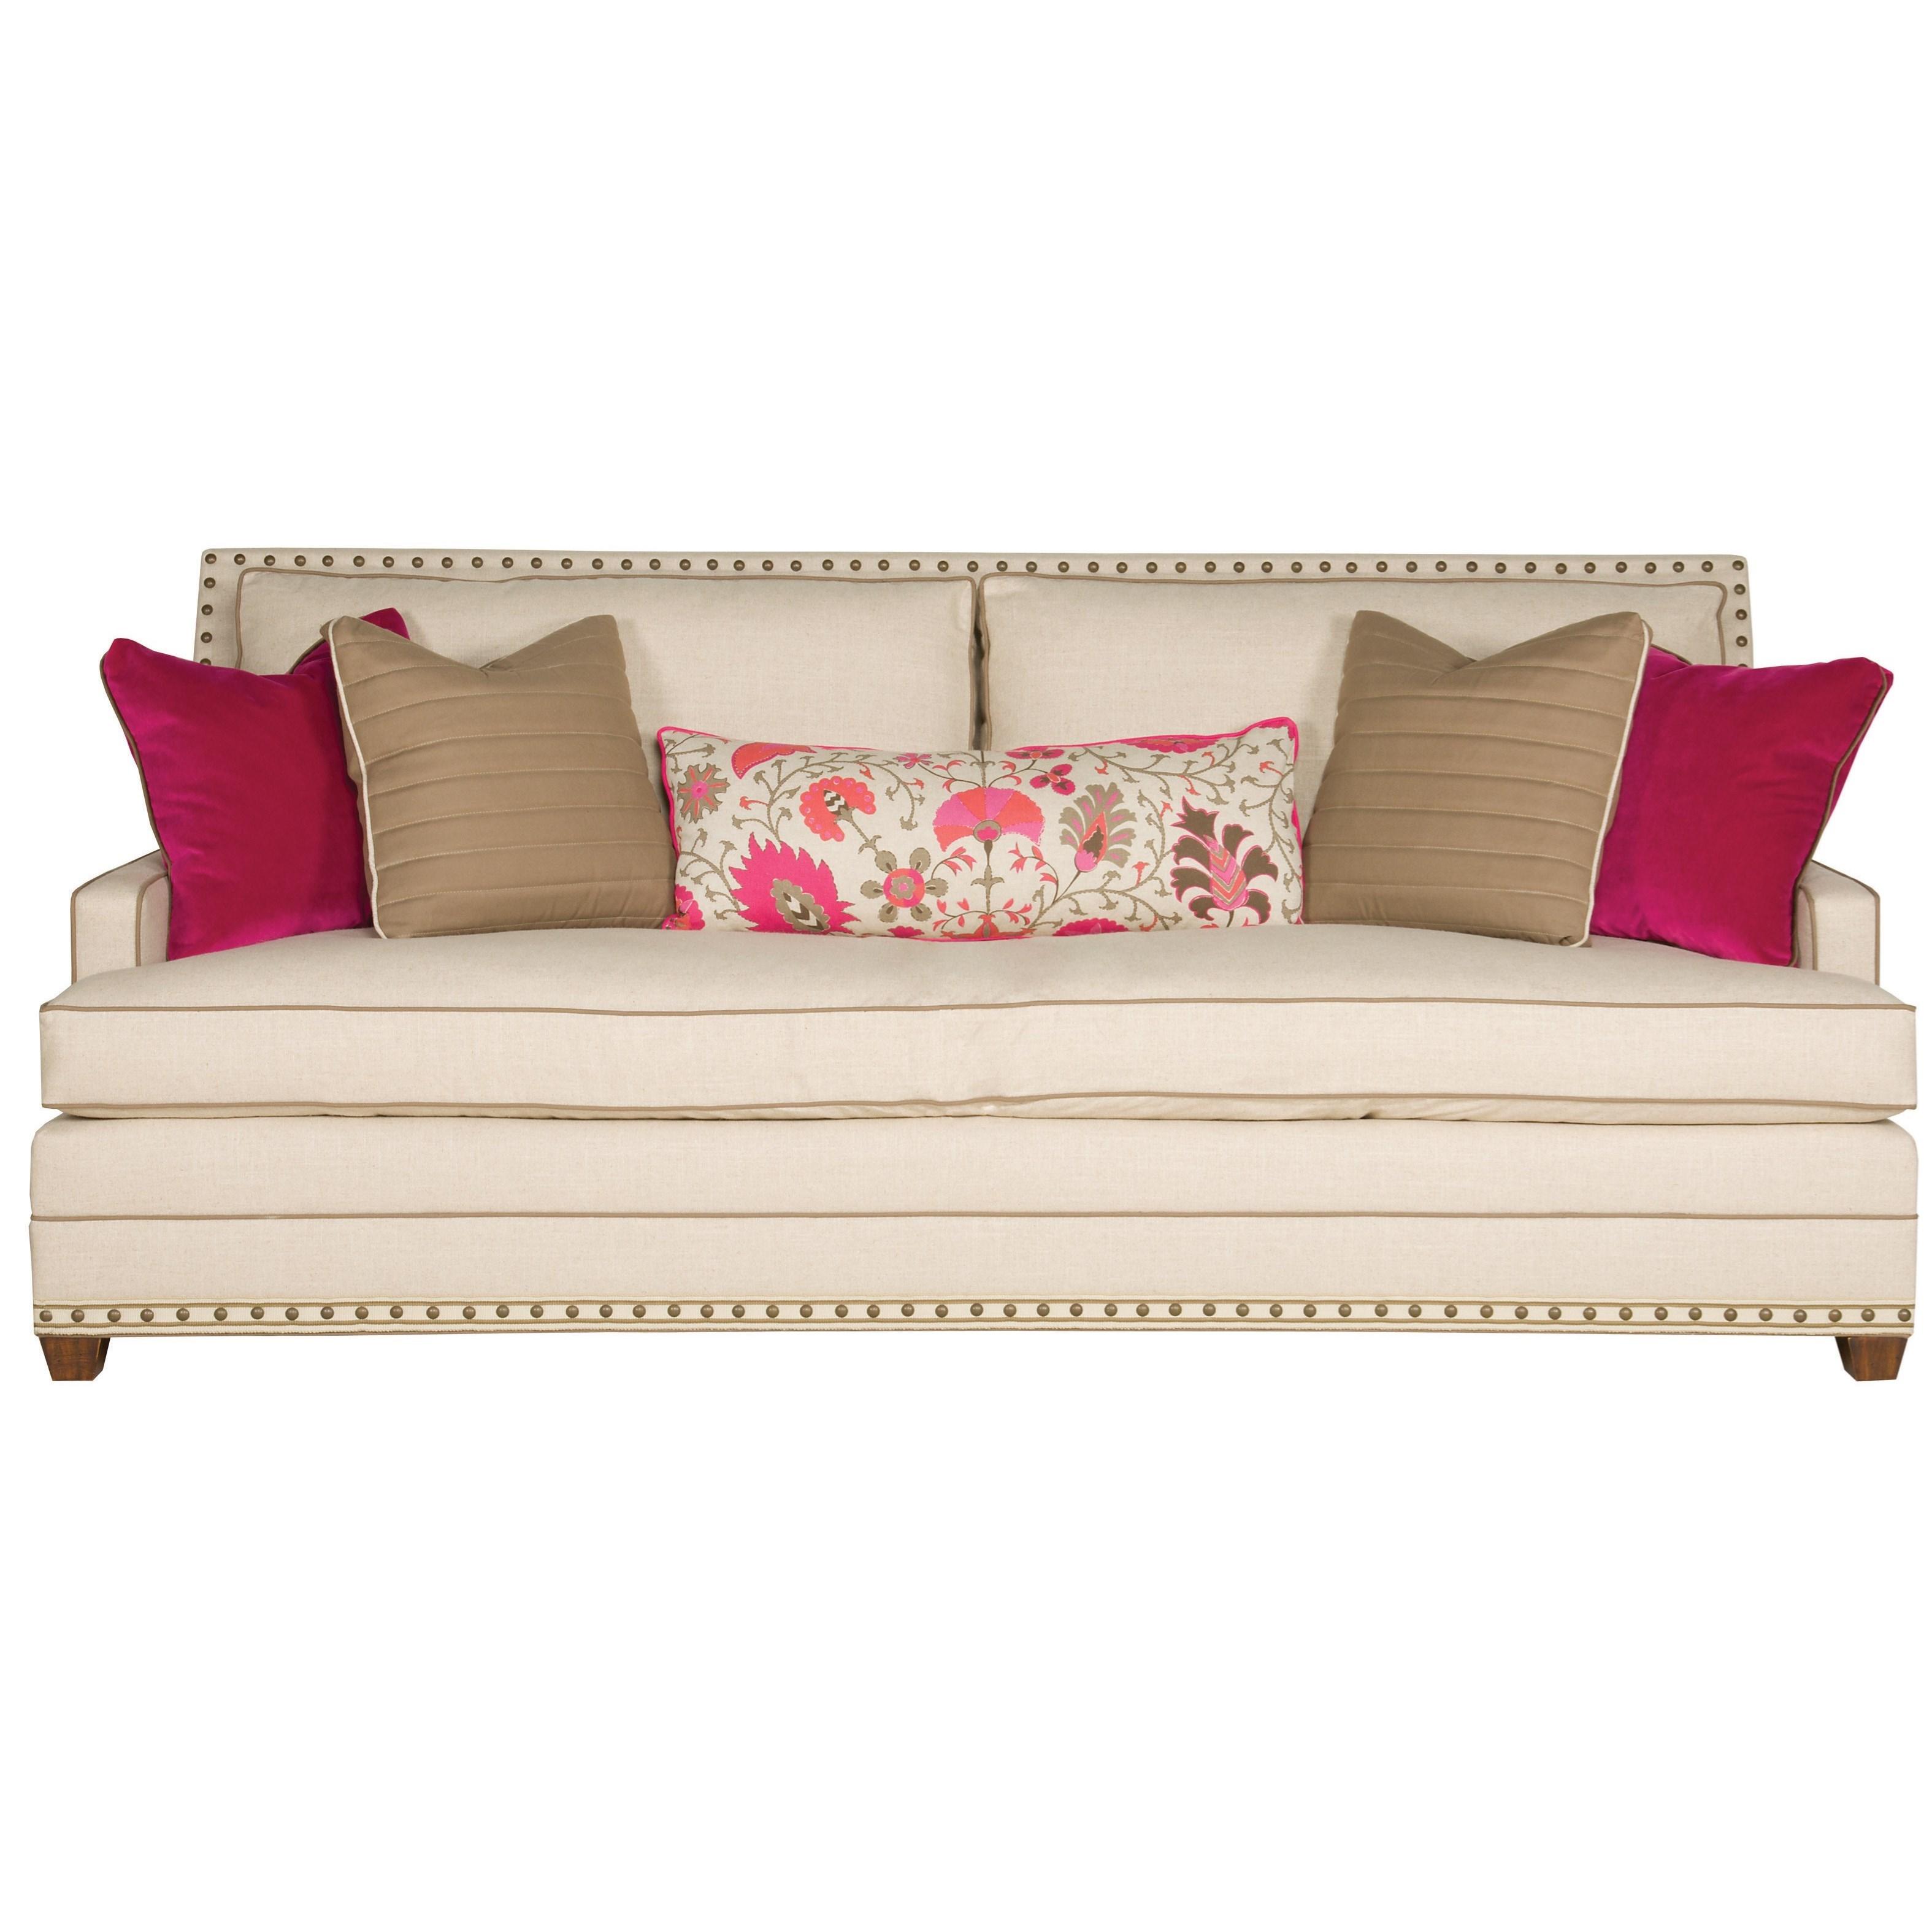 American Bungalow Riverside Sofa by Vanguard Furniture at Baer's Furniture